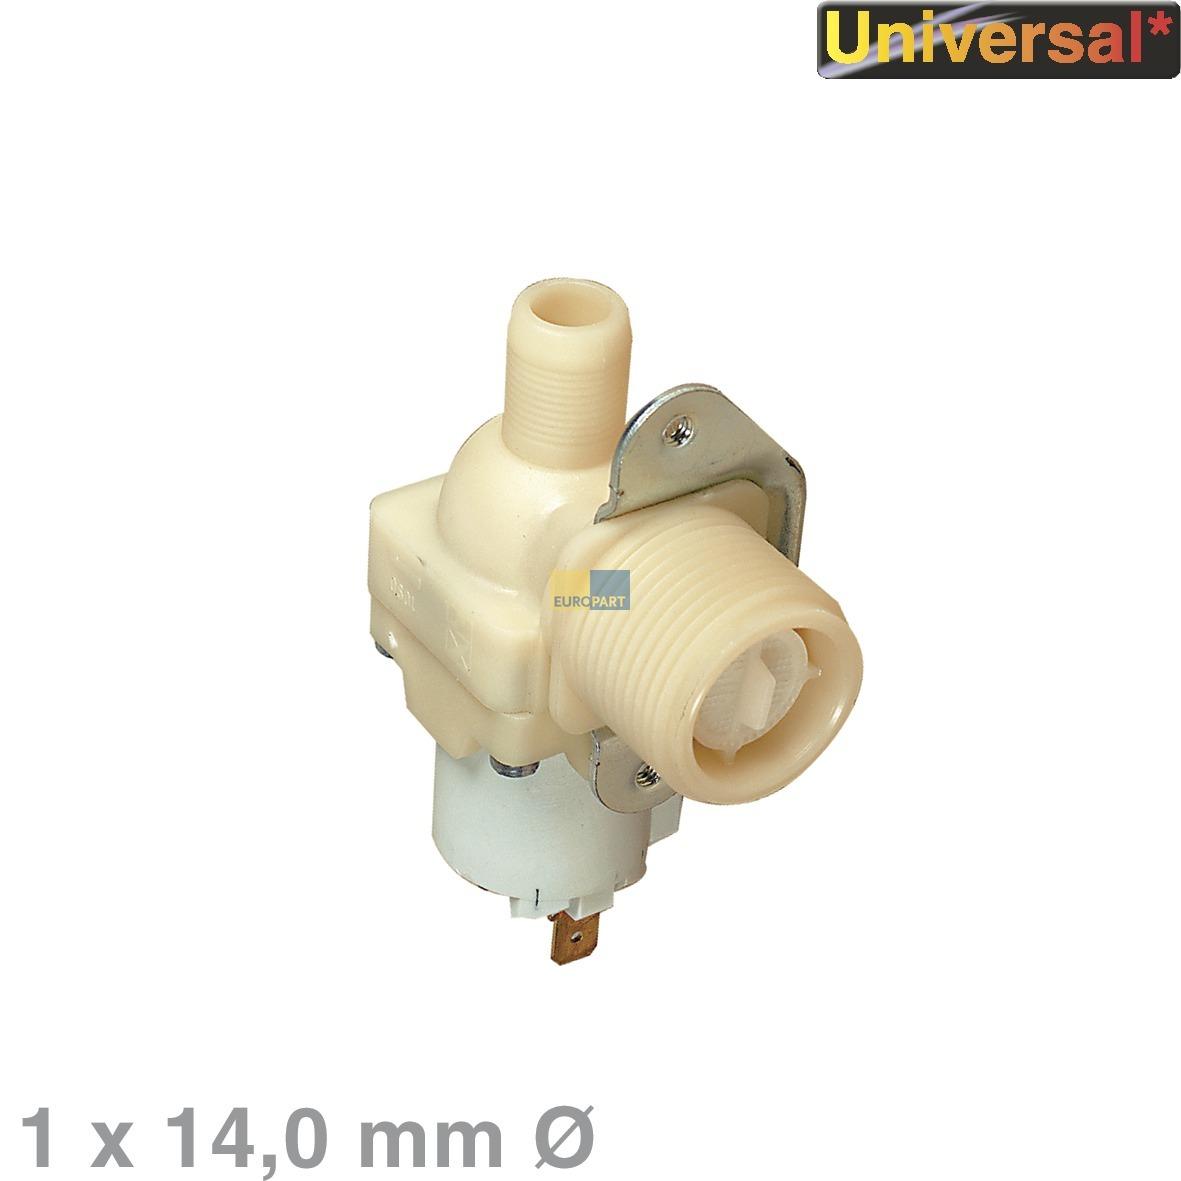 Universal! Magnetventil 1-fach 90° 14,0mmØ